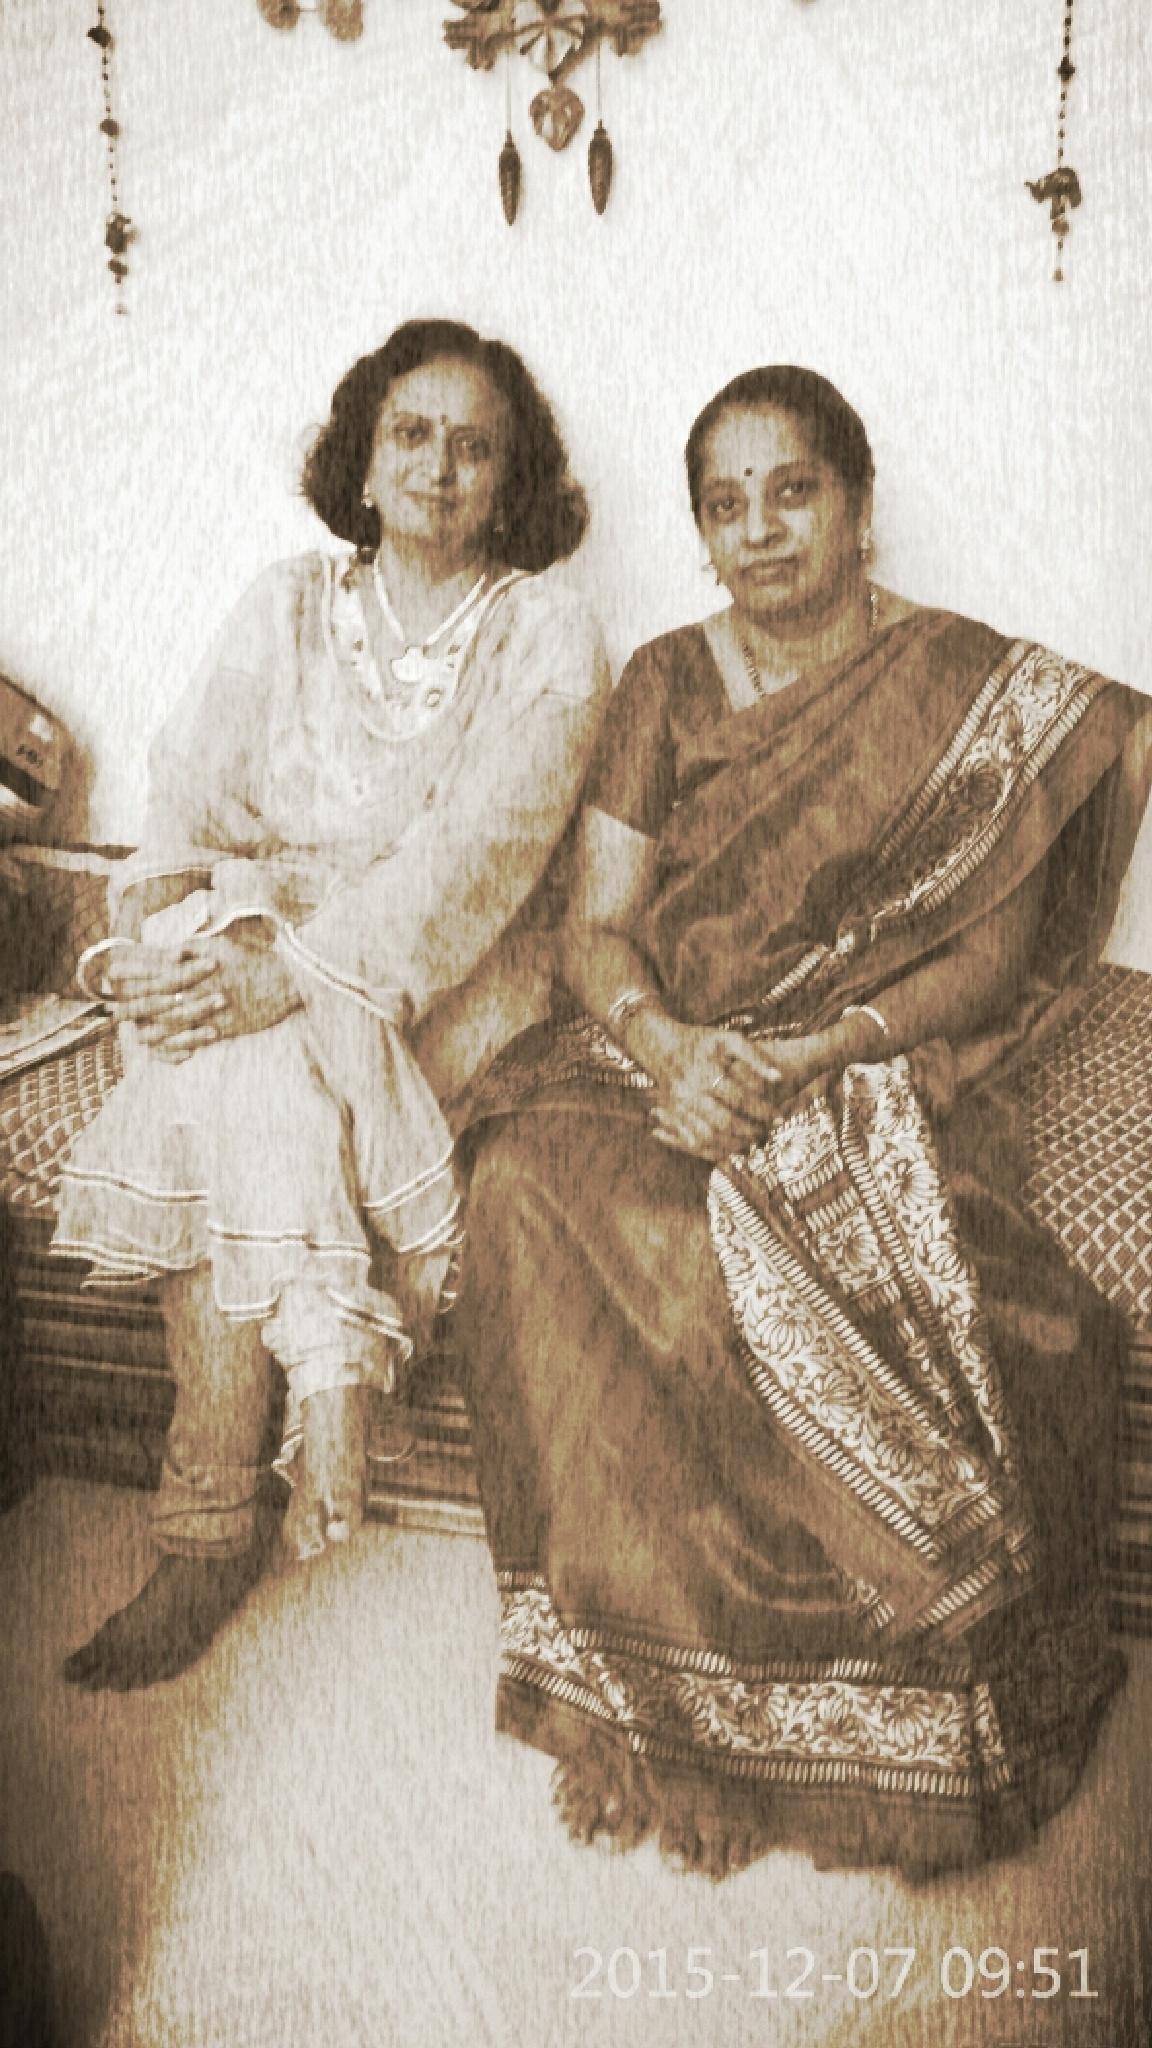 Remembering past by ushapandya19